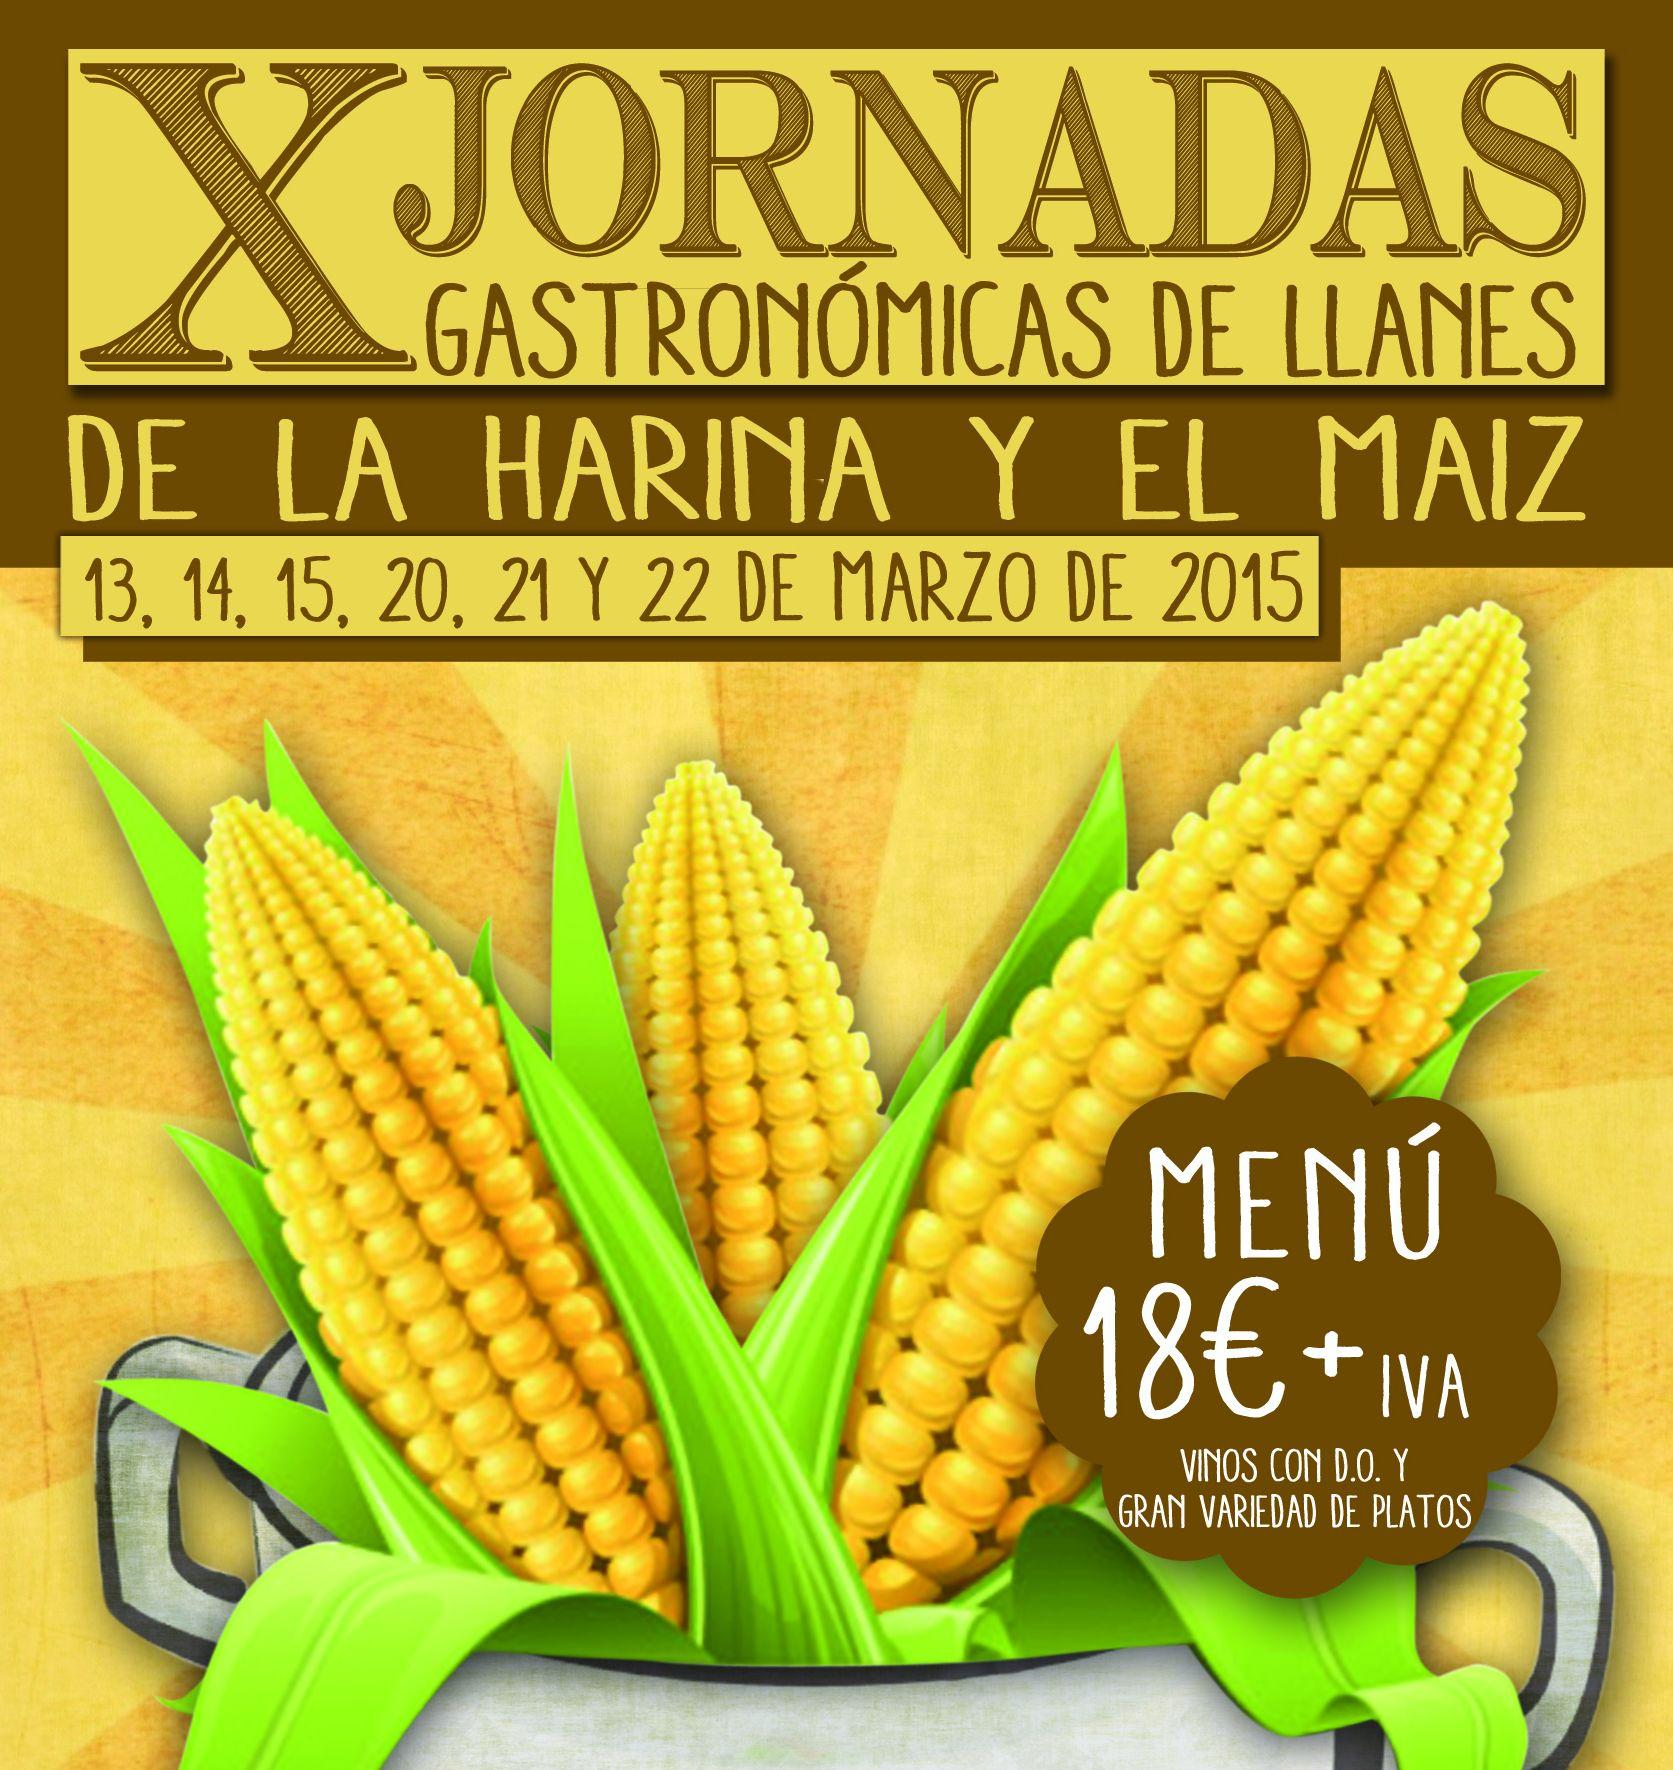 JornadasGastronomicasHarinaMaizLlanes2015r